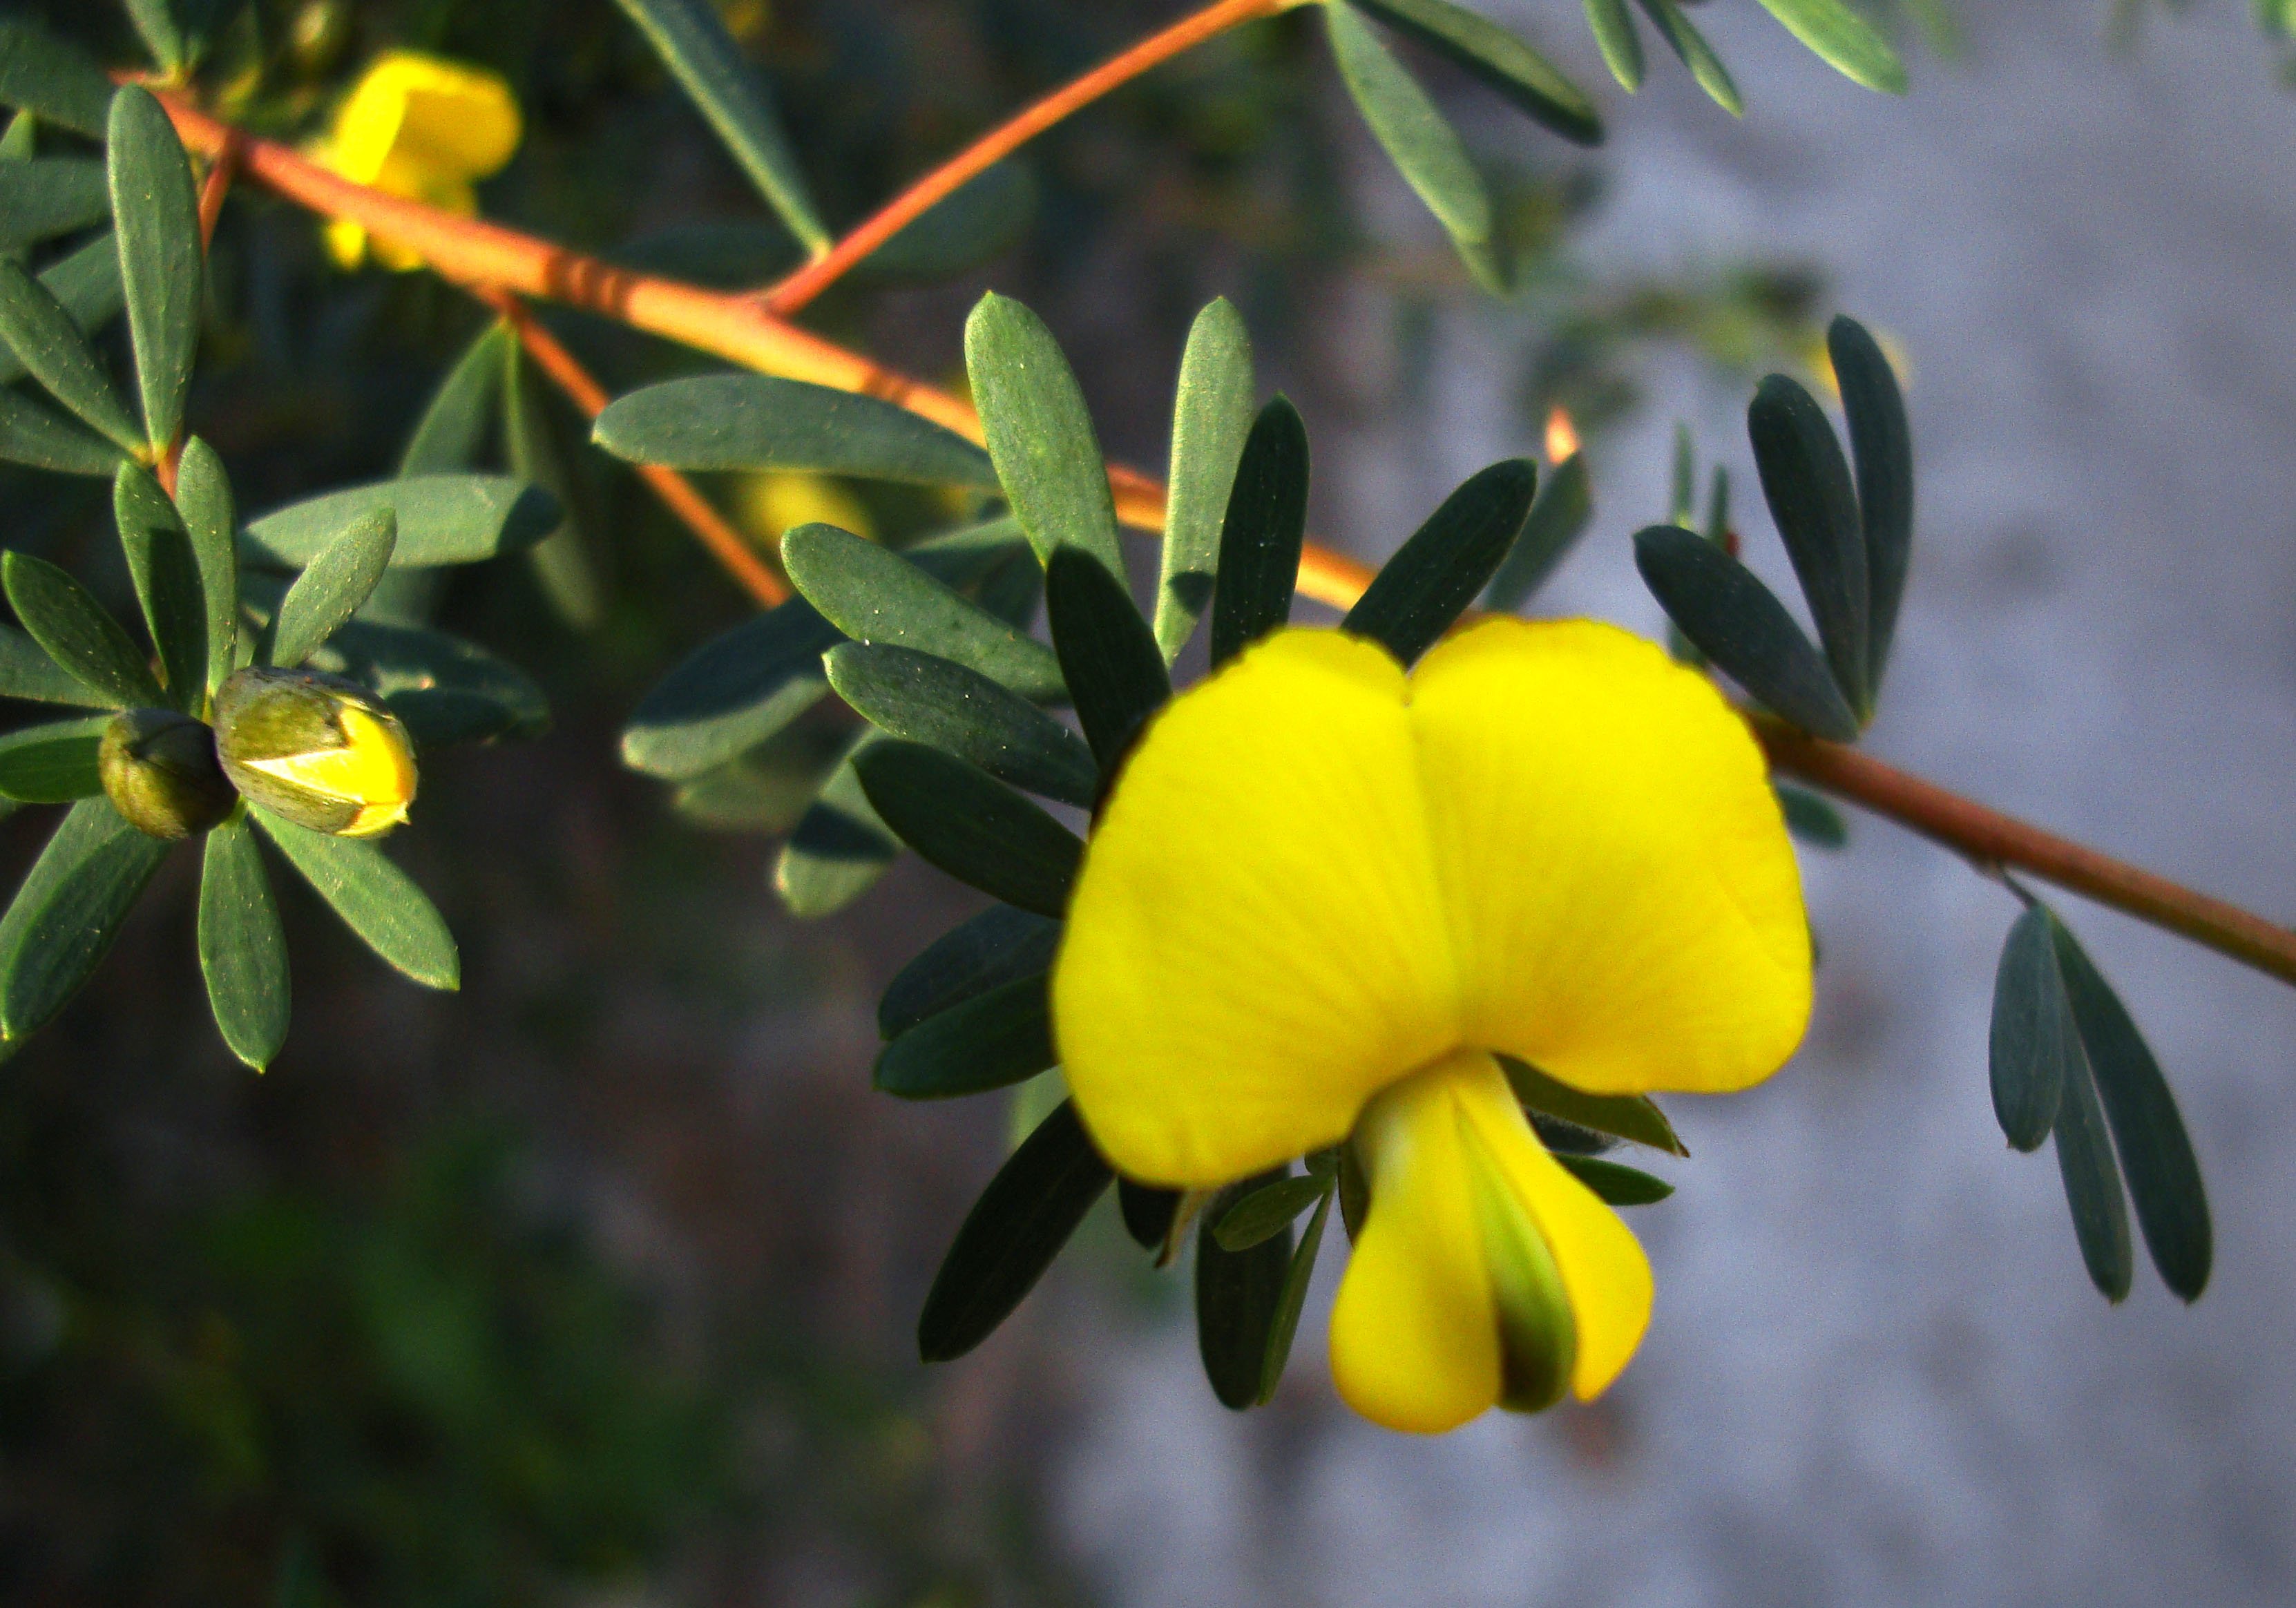 Tiny bush flowers Noosa National Park Qld Australia 23